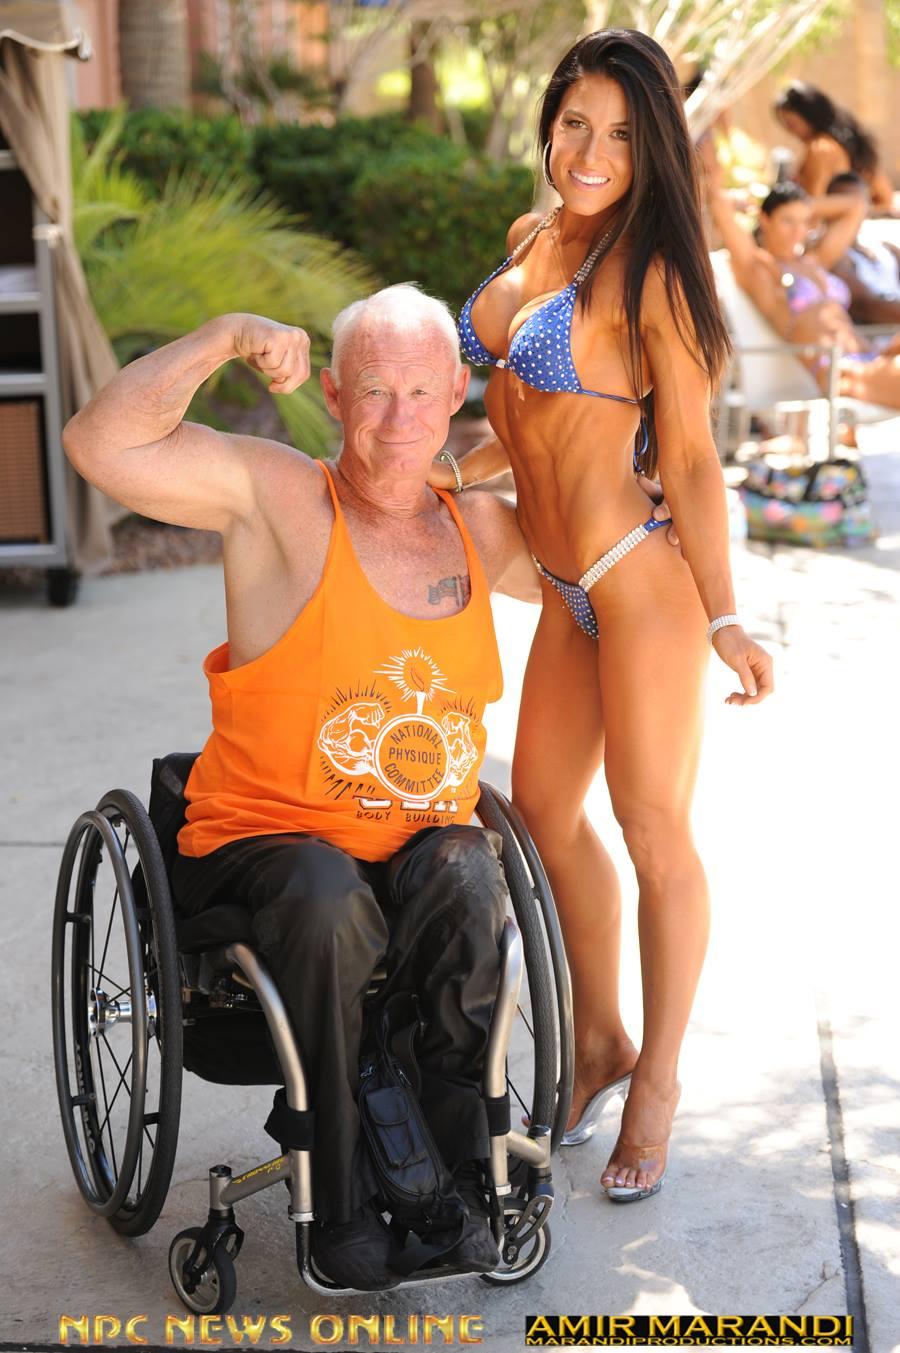 Jack McCann and a bikini competitor